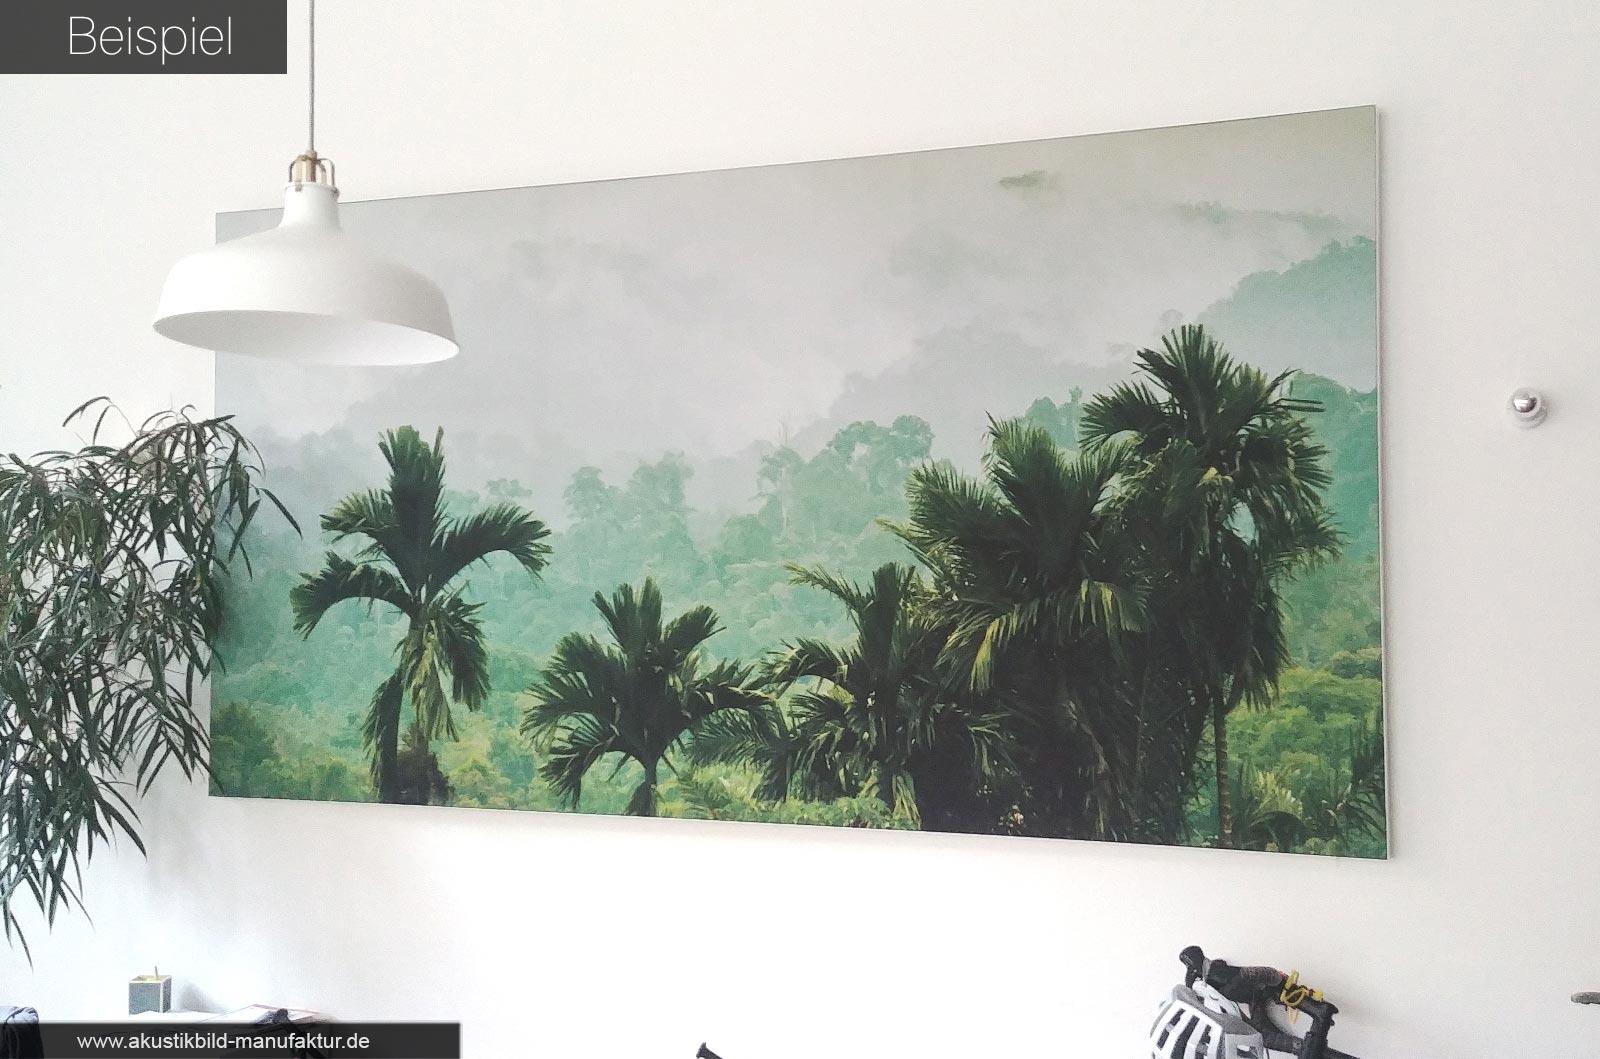 Akustikbilder mit Dschungel Natur Motiven